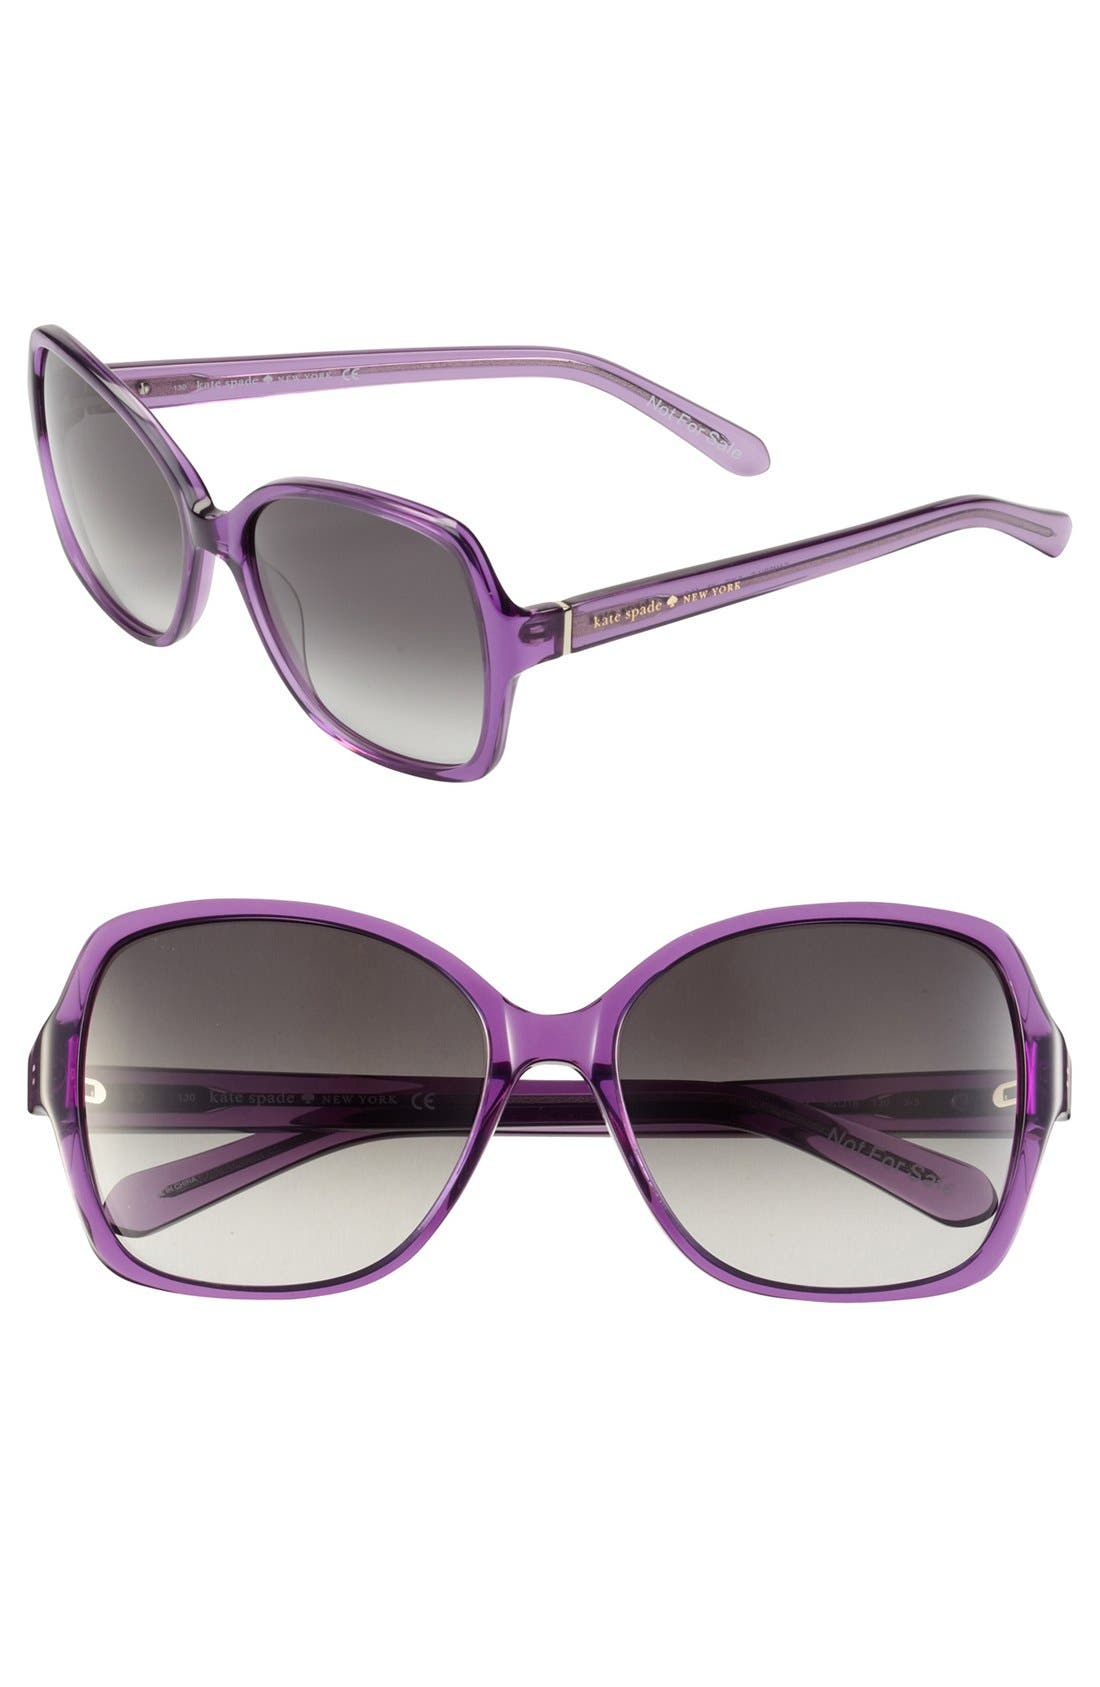 Main Image - kate spade new york 'cambria' 56mm sunglasses